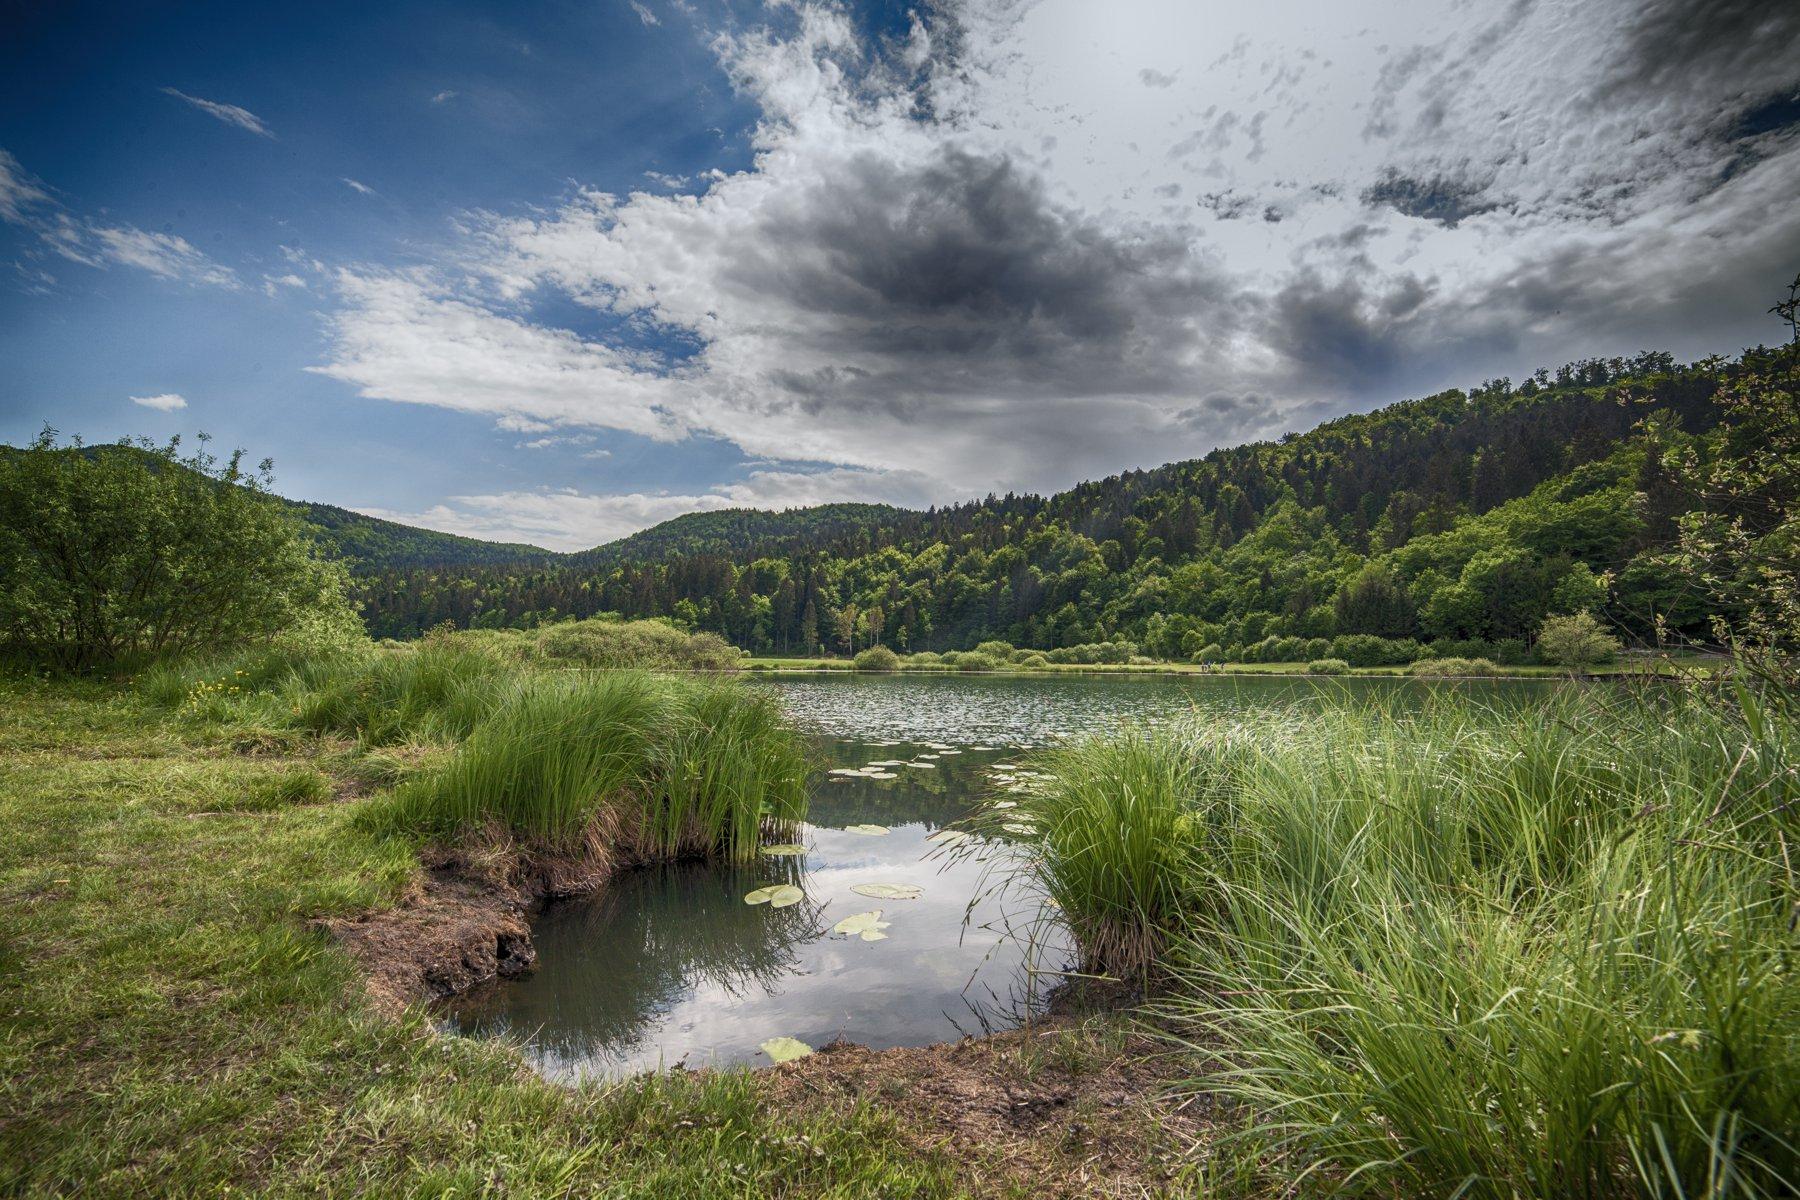 Podpec Lake Lies On The Outskirts Of Ljubljana Slovenia